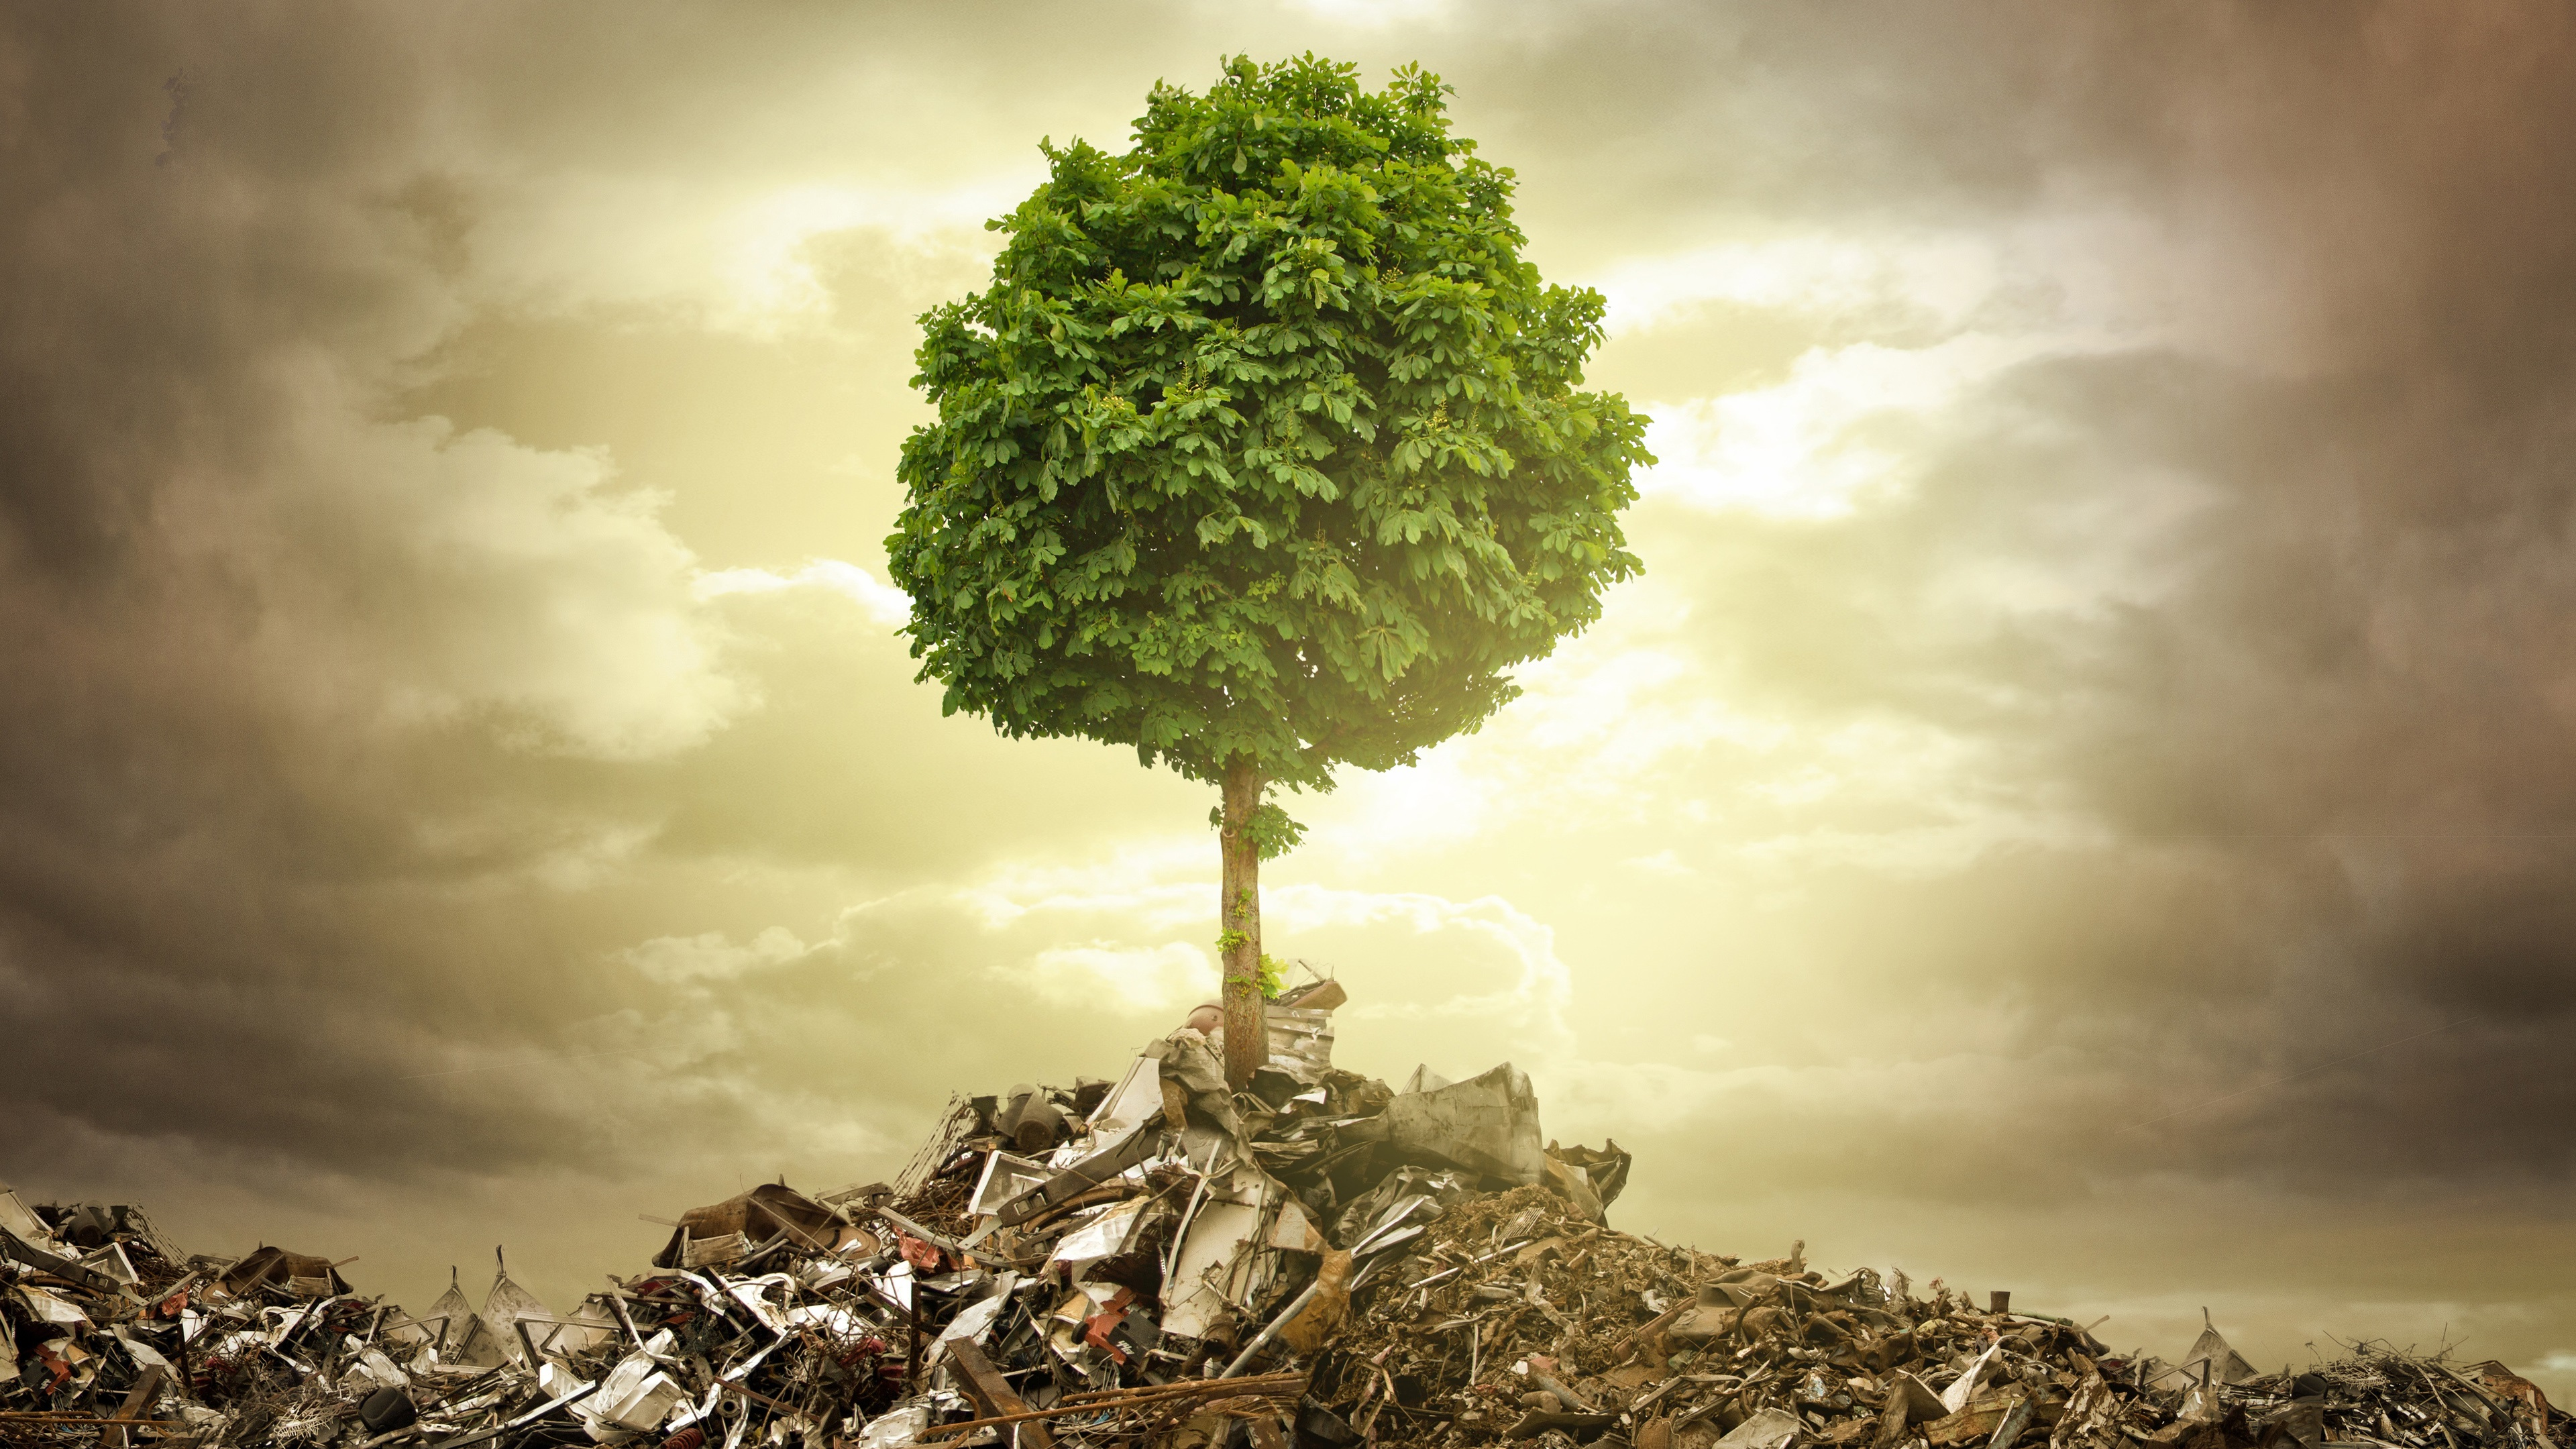 Wallpaper Single tree garbage wreckage 3840x2160 UHD 4K Picture 3840x2160